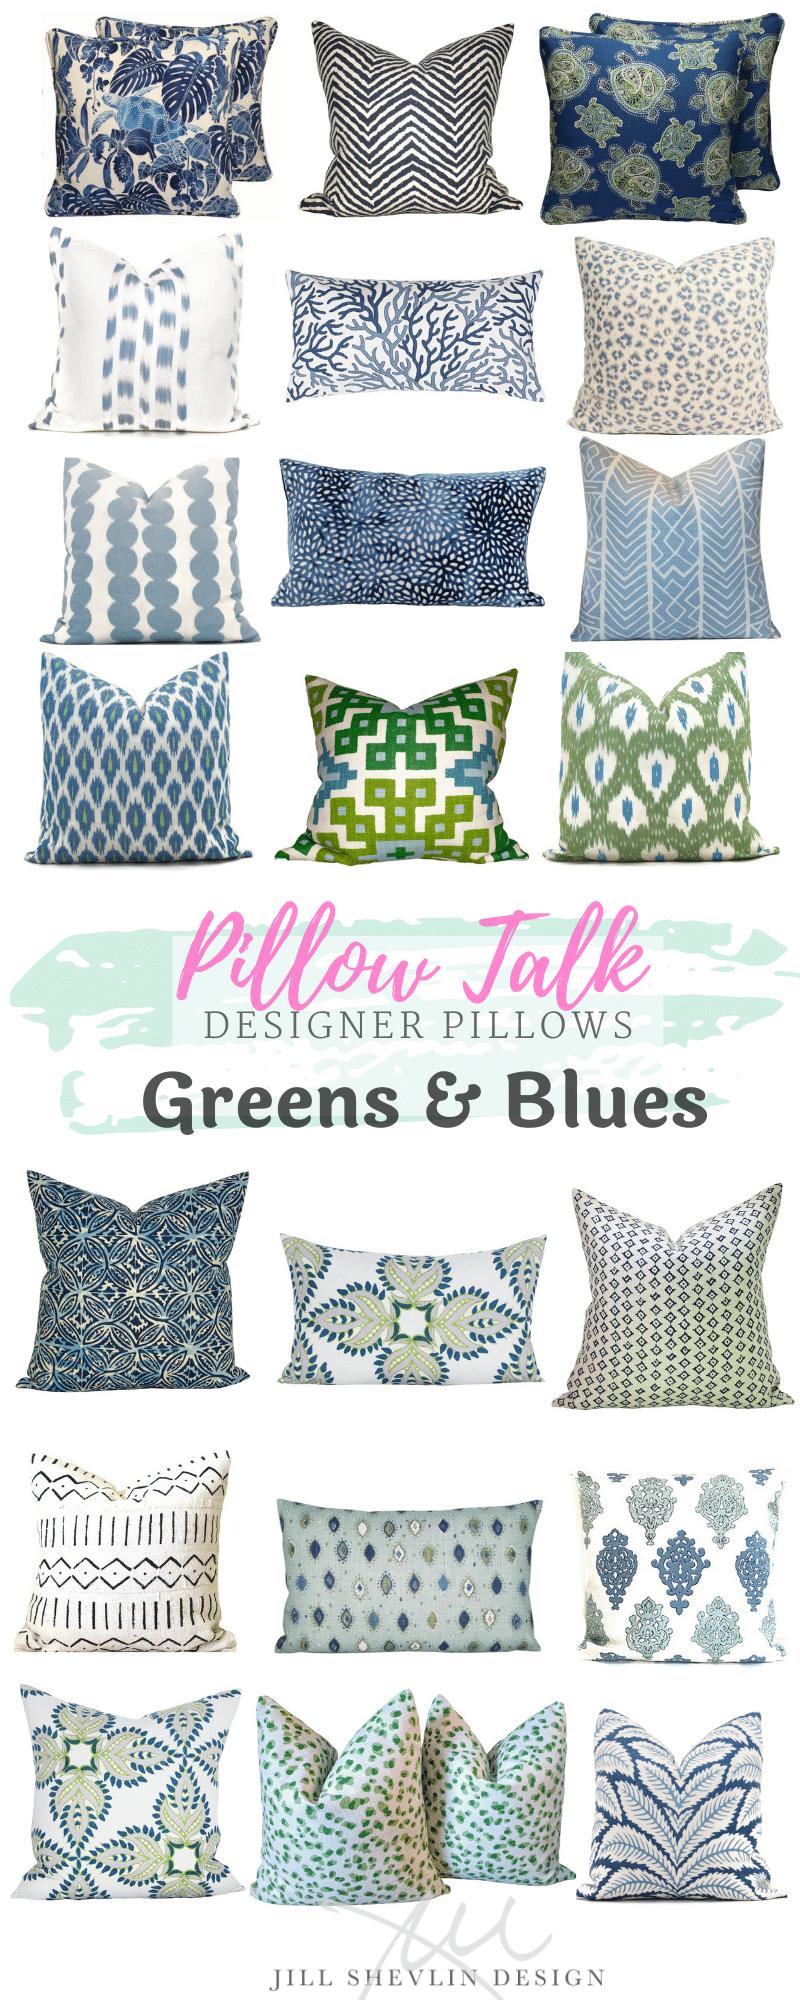 Pillow Talk Green & Blue Jill shevlin Design Vero Beach Interior Designer Vero Beach Home decor